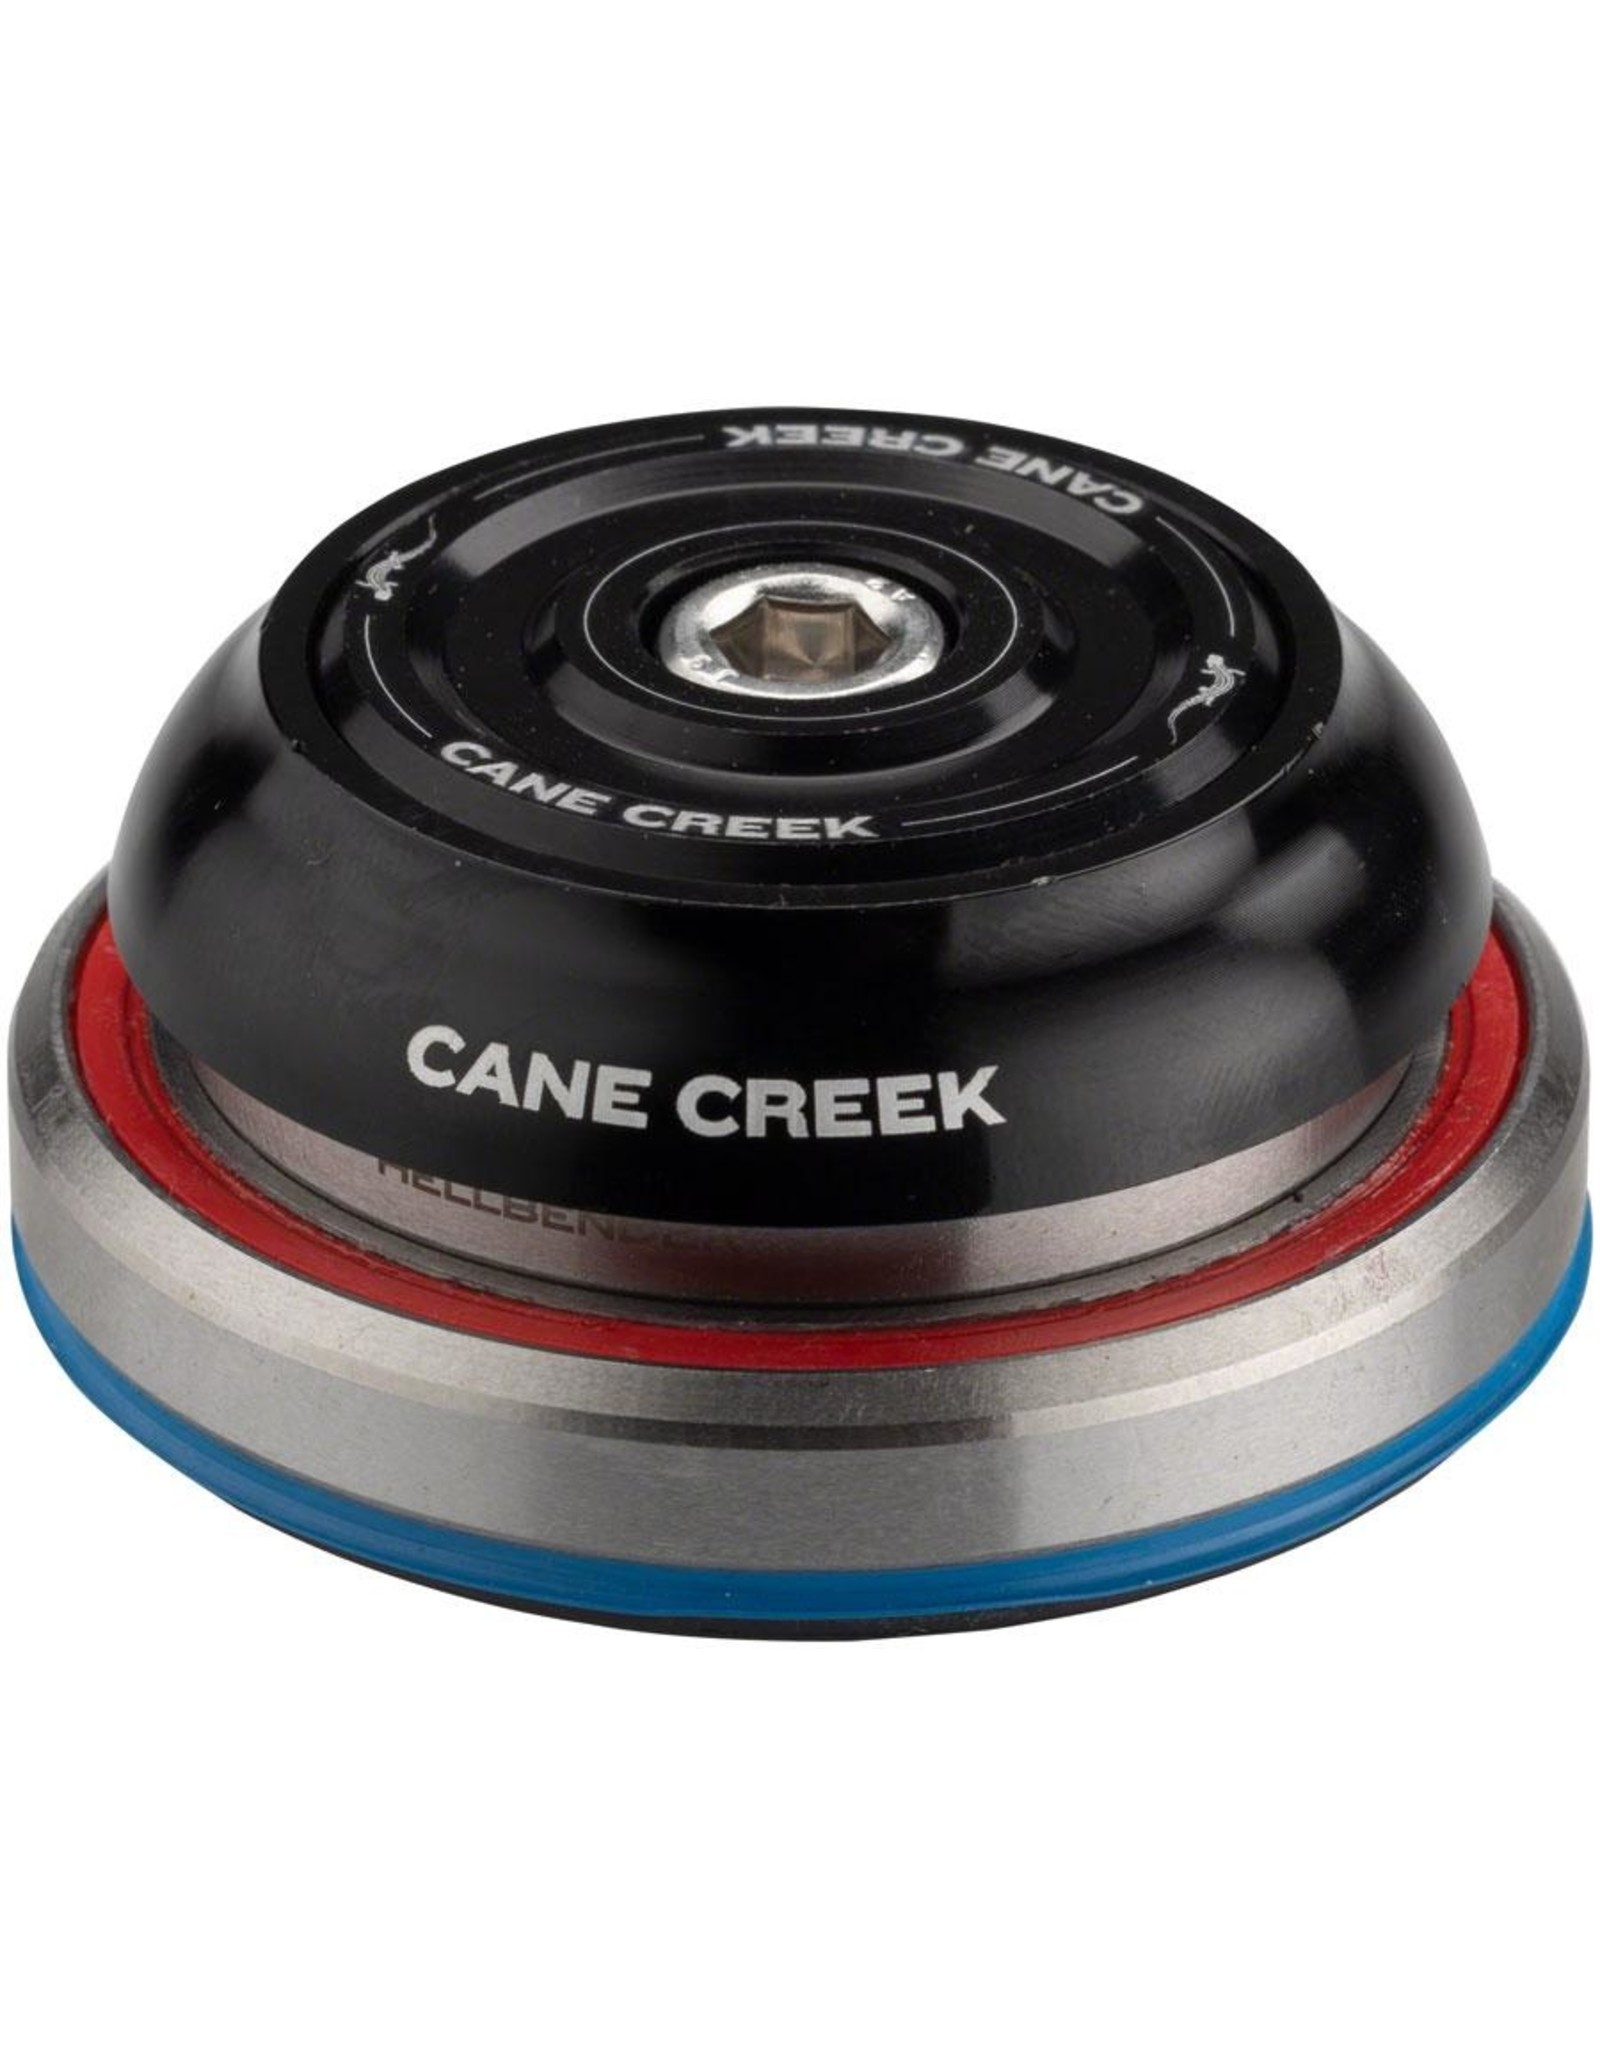 Cane Creek 70-Series Headset, IS41/28.6-IS52/40 Black